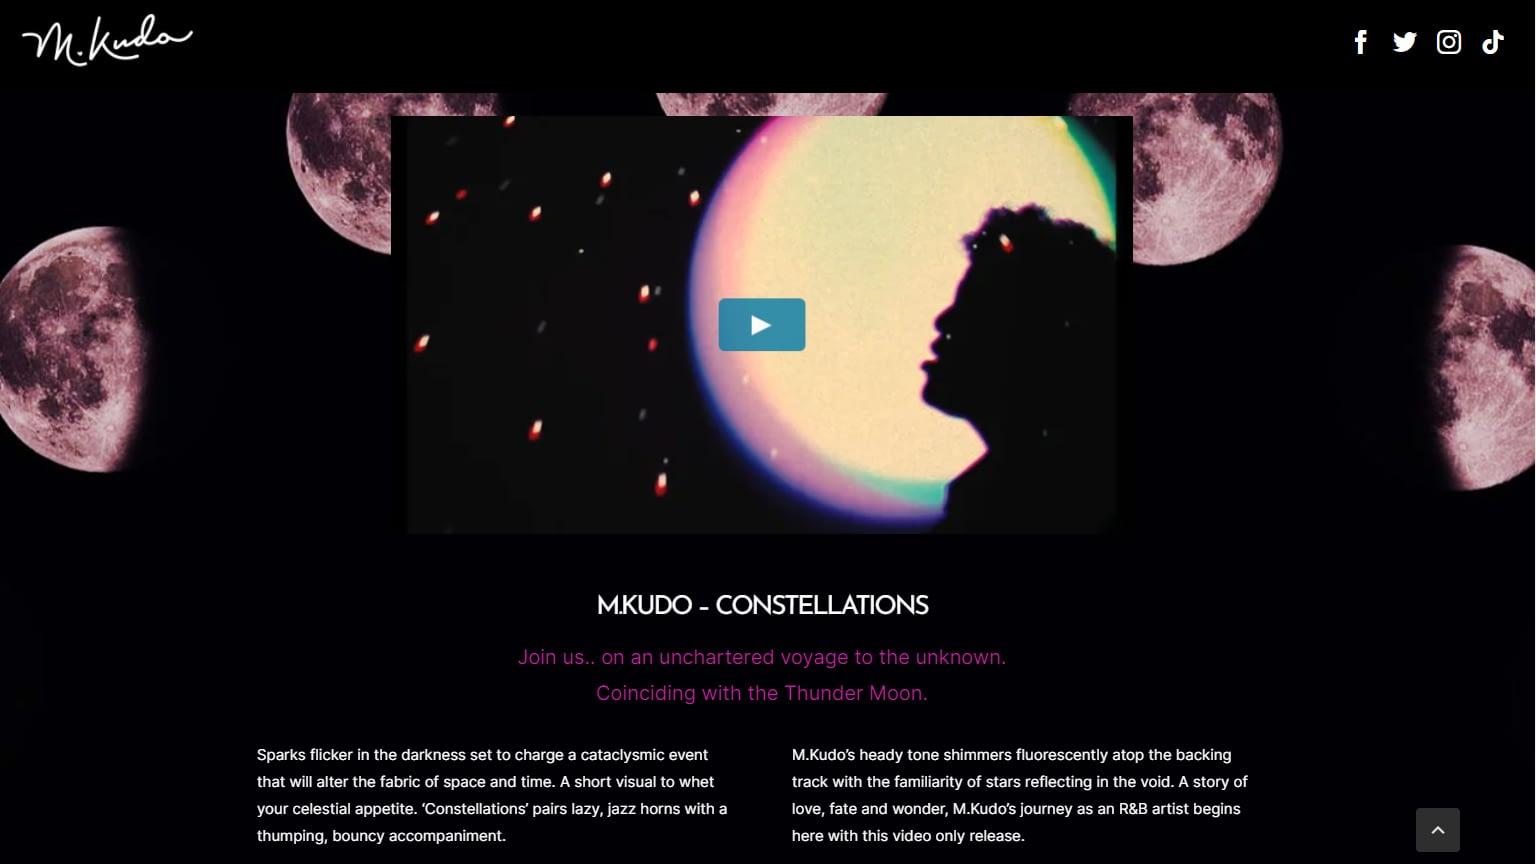 golivenow.uk website design M Kudo Music screenshot 2 - golivenow.uk